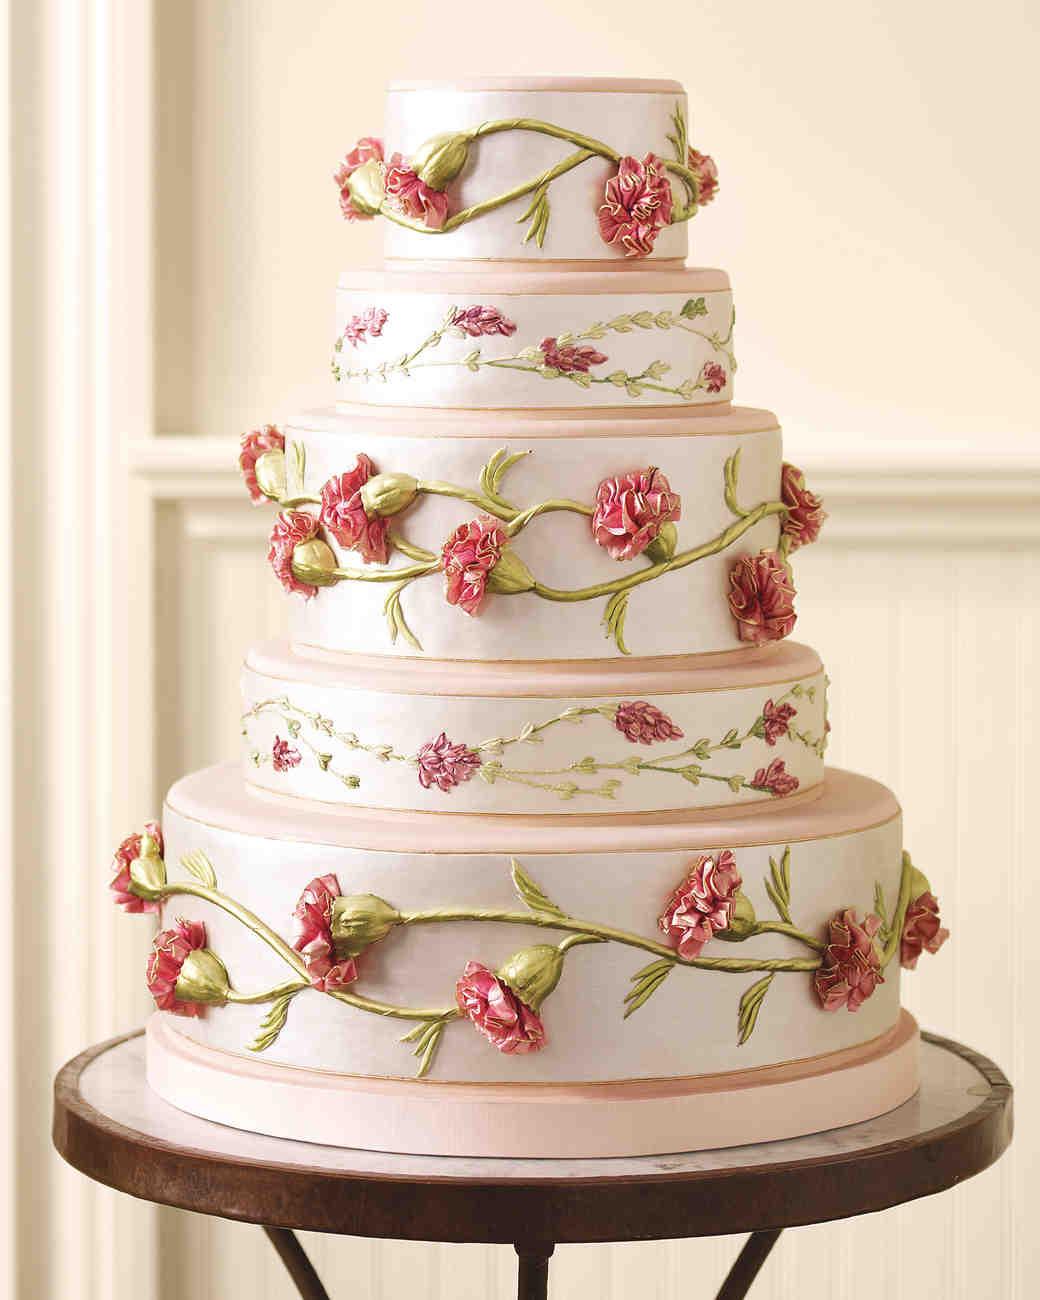 ron-ben-israel-cakes-spring-2010-mwd105426eribbon2a-0814.jpg